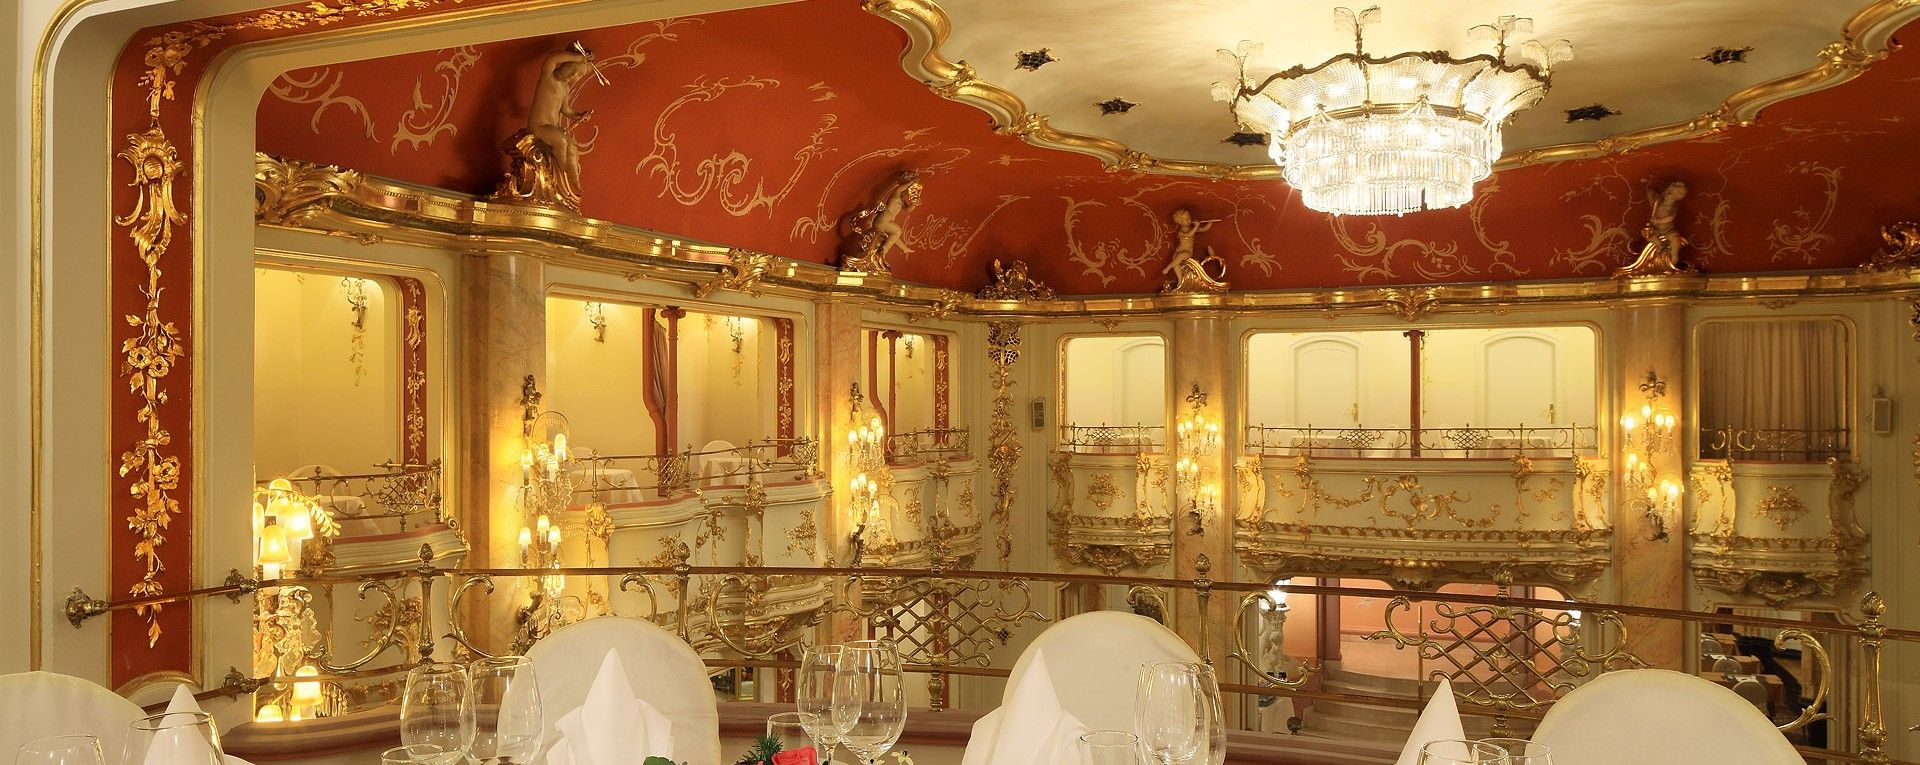 Grand hotel bohemia hotel prague czech republic europe for Grand hotel bohemia hotel prague